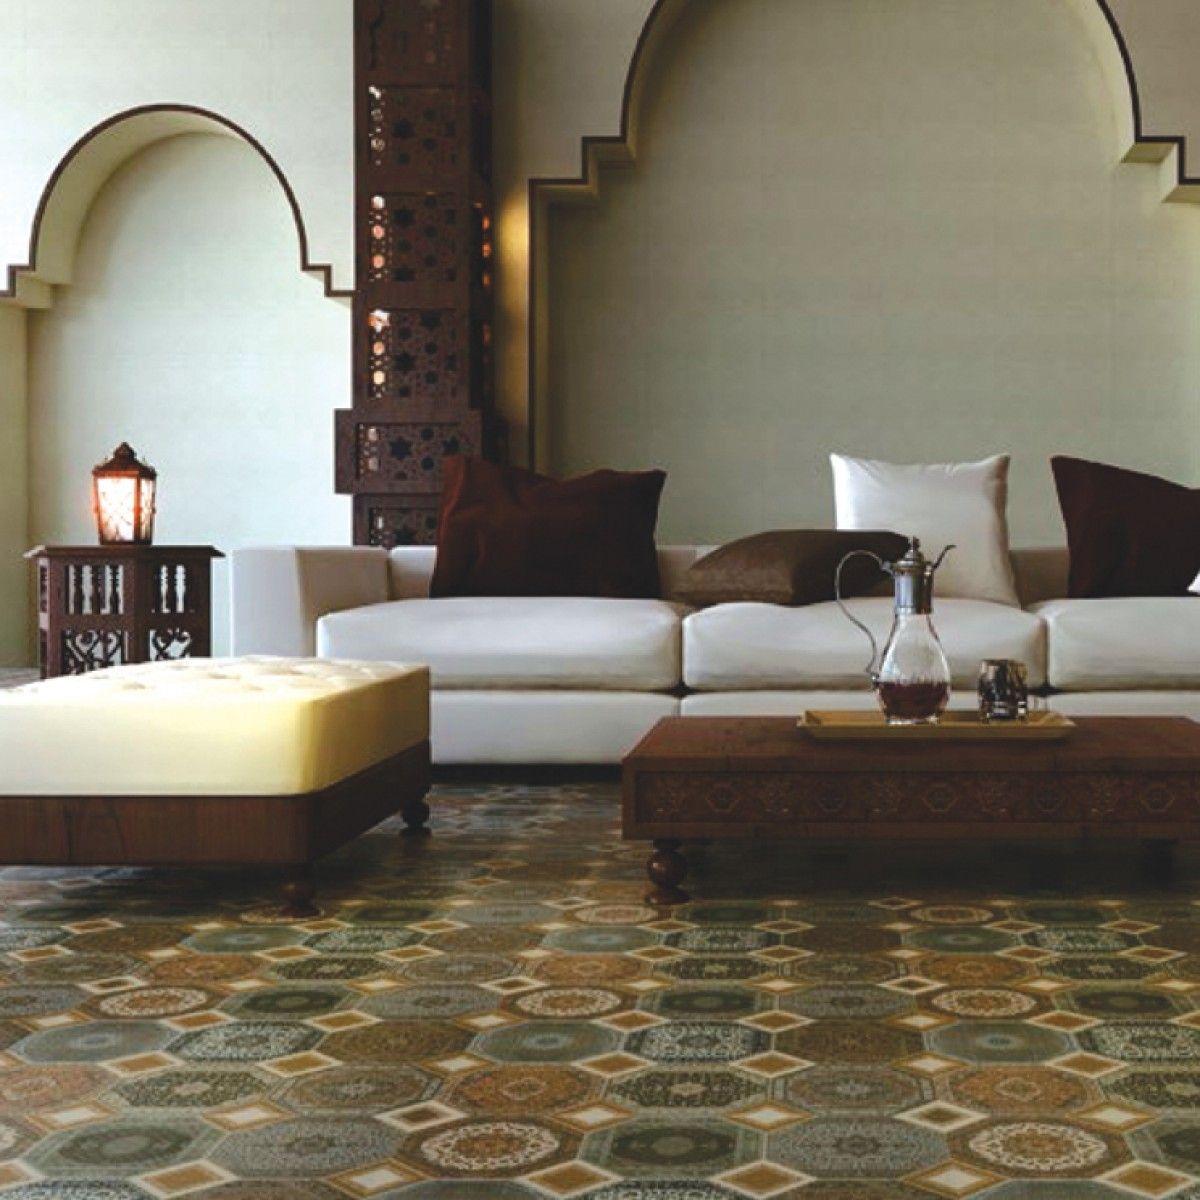 Crown tiles 60x60cm ecadin floor tiles crown tiles ceramic floor tiles dailygadgetfo Choice Image